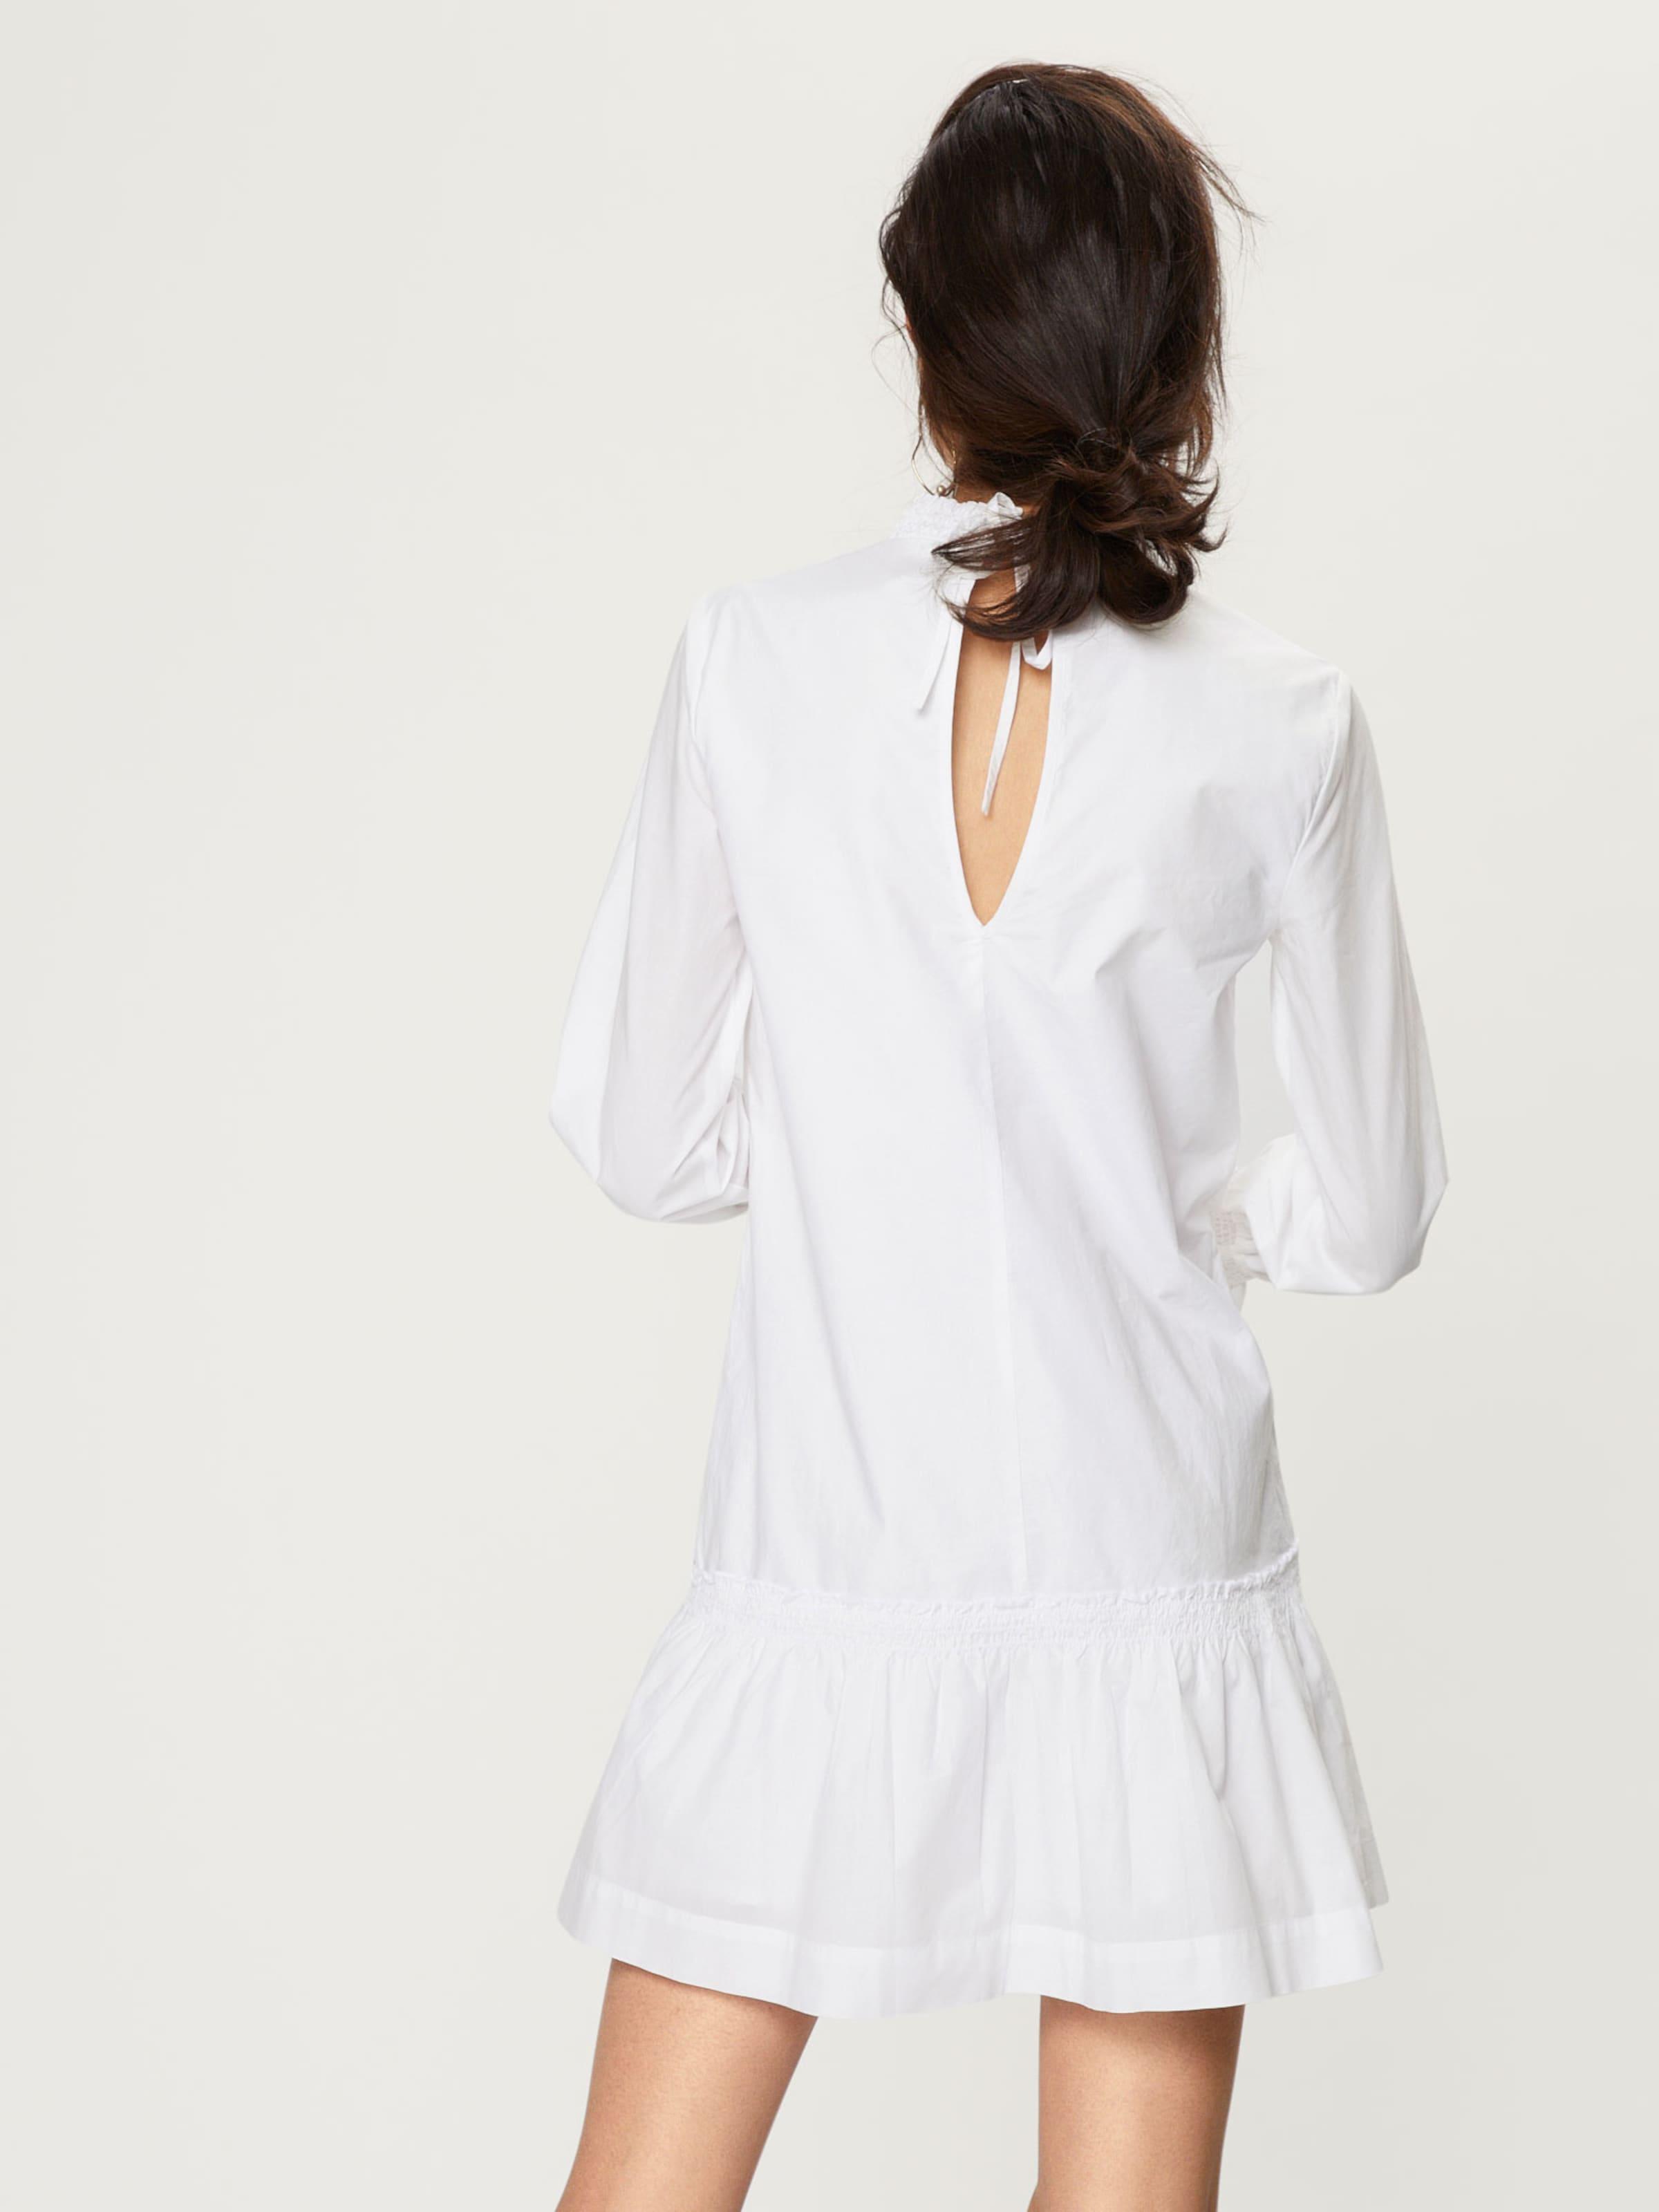 En 'piper' Robe 'piper' En En Edited Robe 'piper' Edited Blanc Edited Robe Blanc CerxBWdo